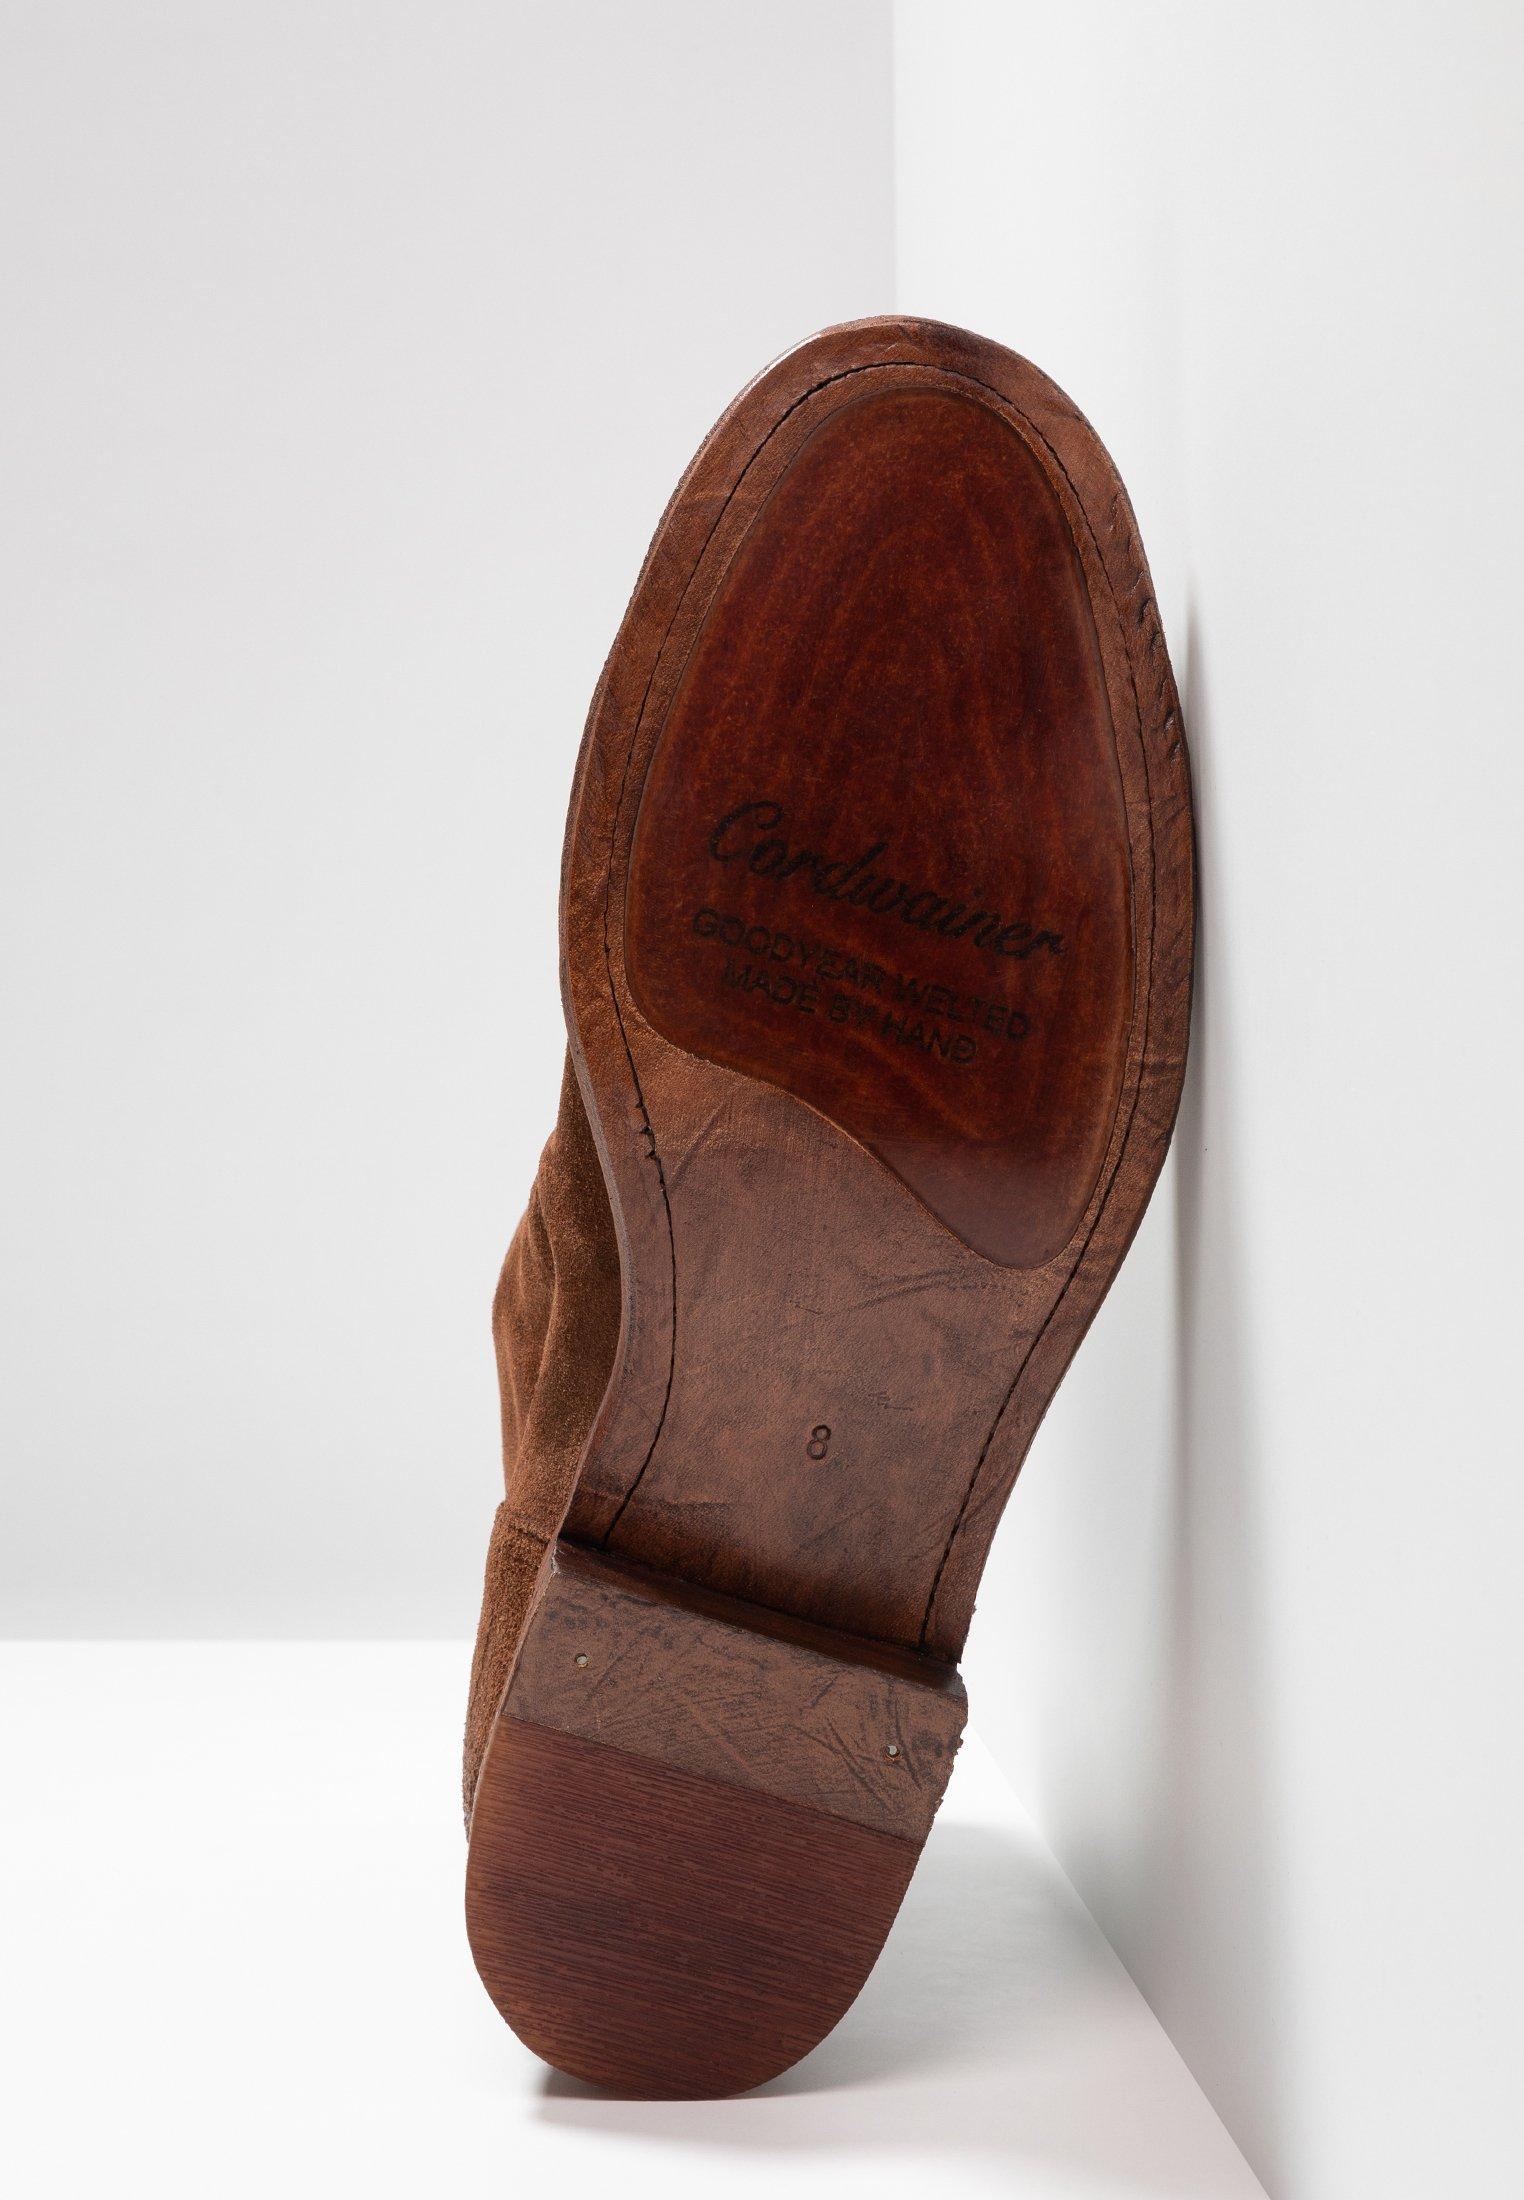 Cordwainer Støvletter - florence snuff